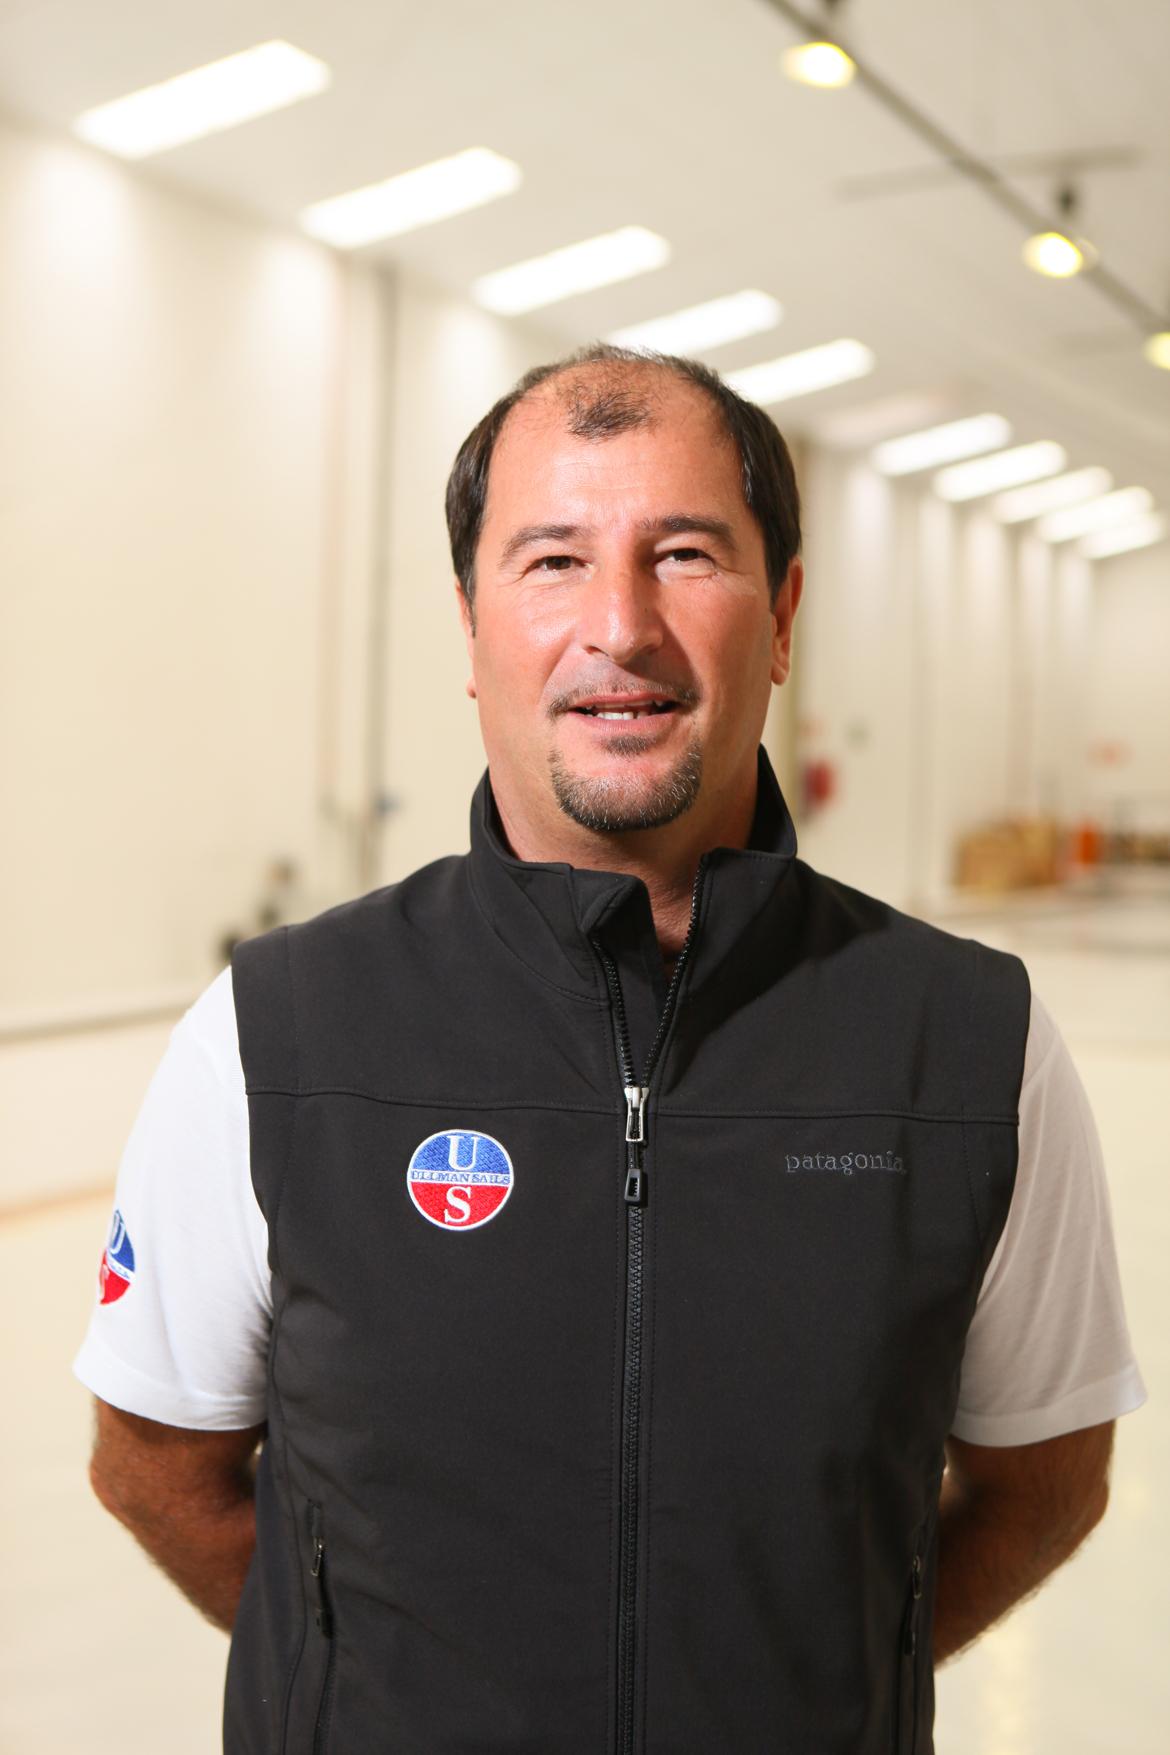 Francesco De Vita of Ullman Sails South Africa